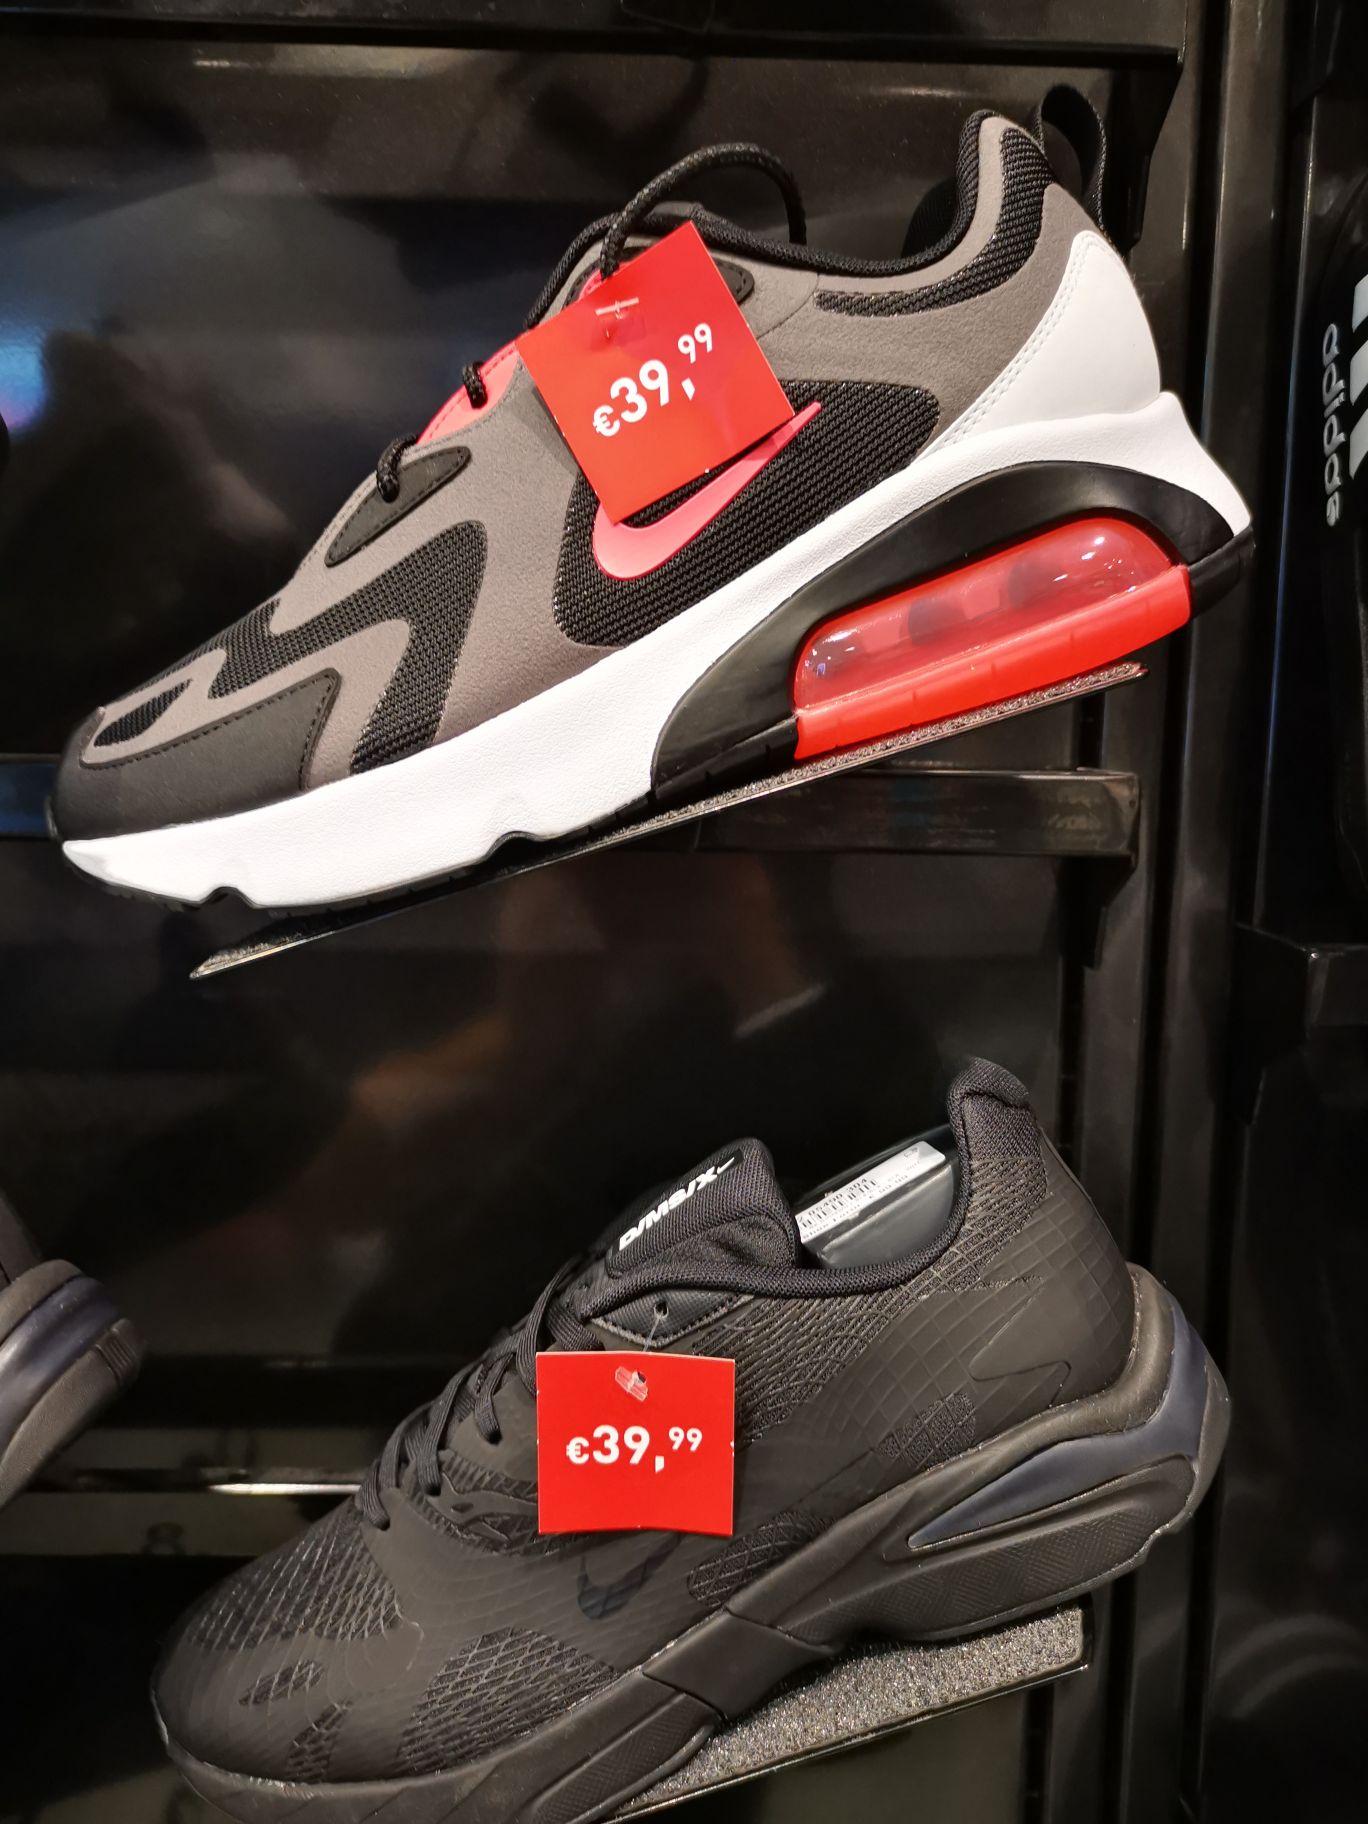 Baskets Nike Air Max 200 React (Noyelles-Godault 62)